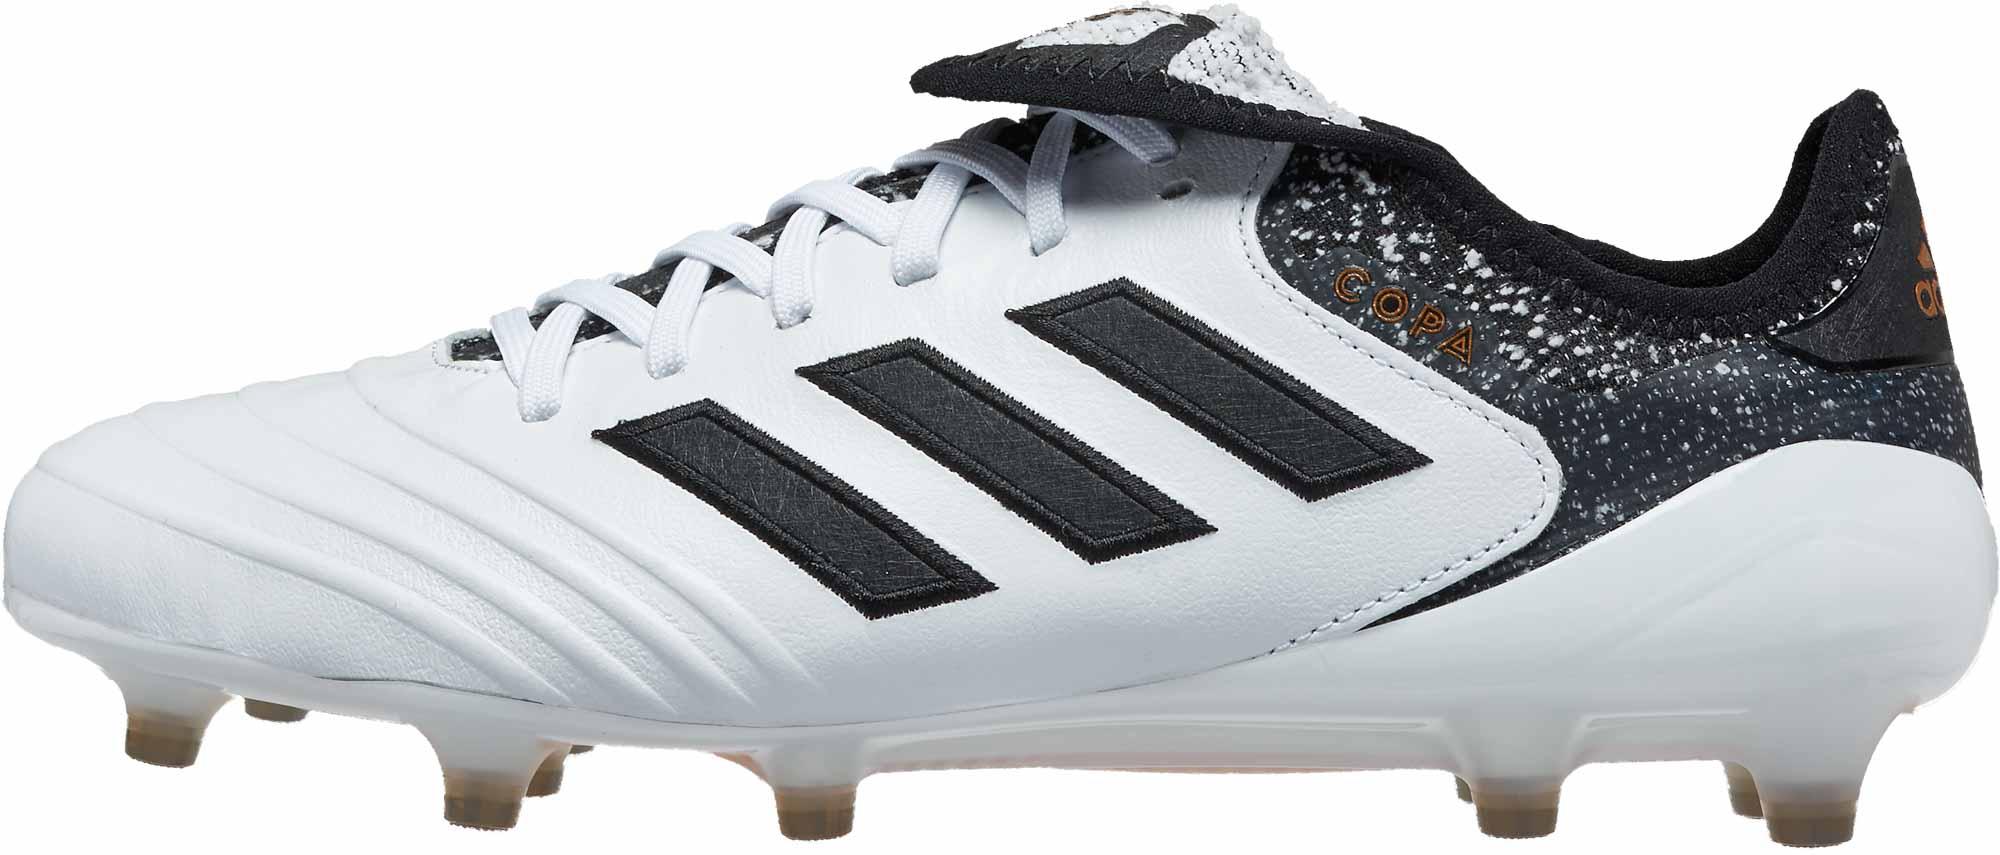 e4b2c7854fb8 adidas Copa 18.1 FG - White   Tactile Gold Metallic - Soccer Master